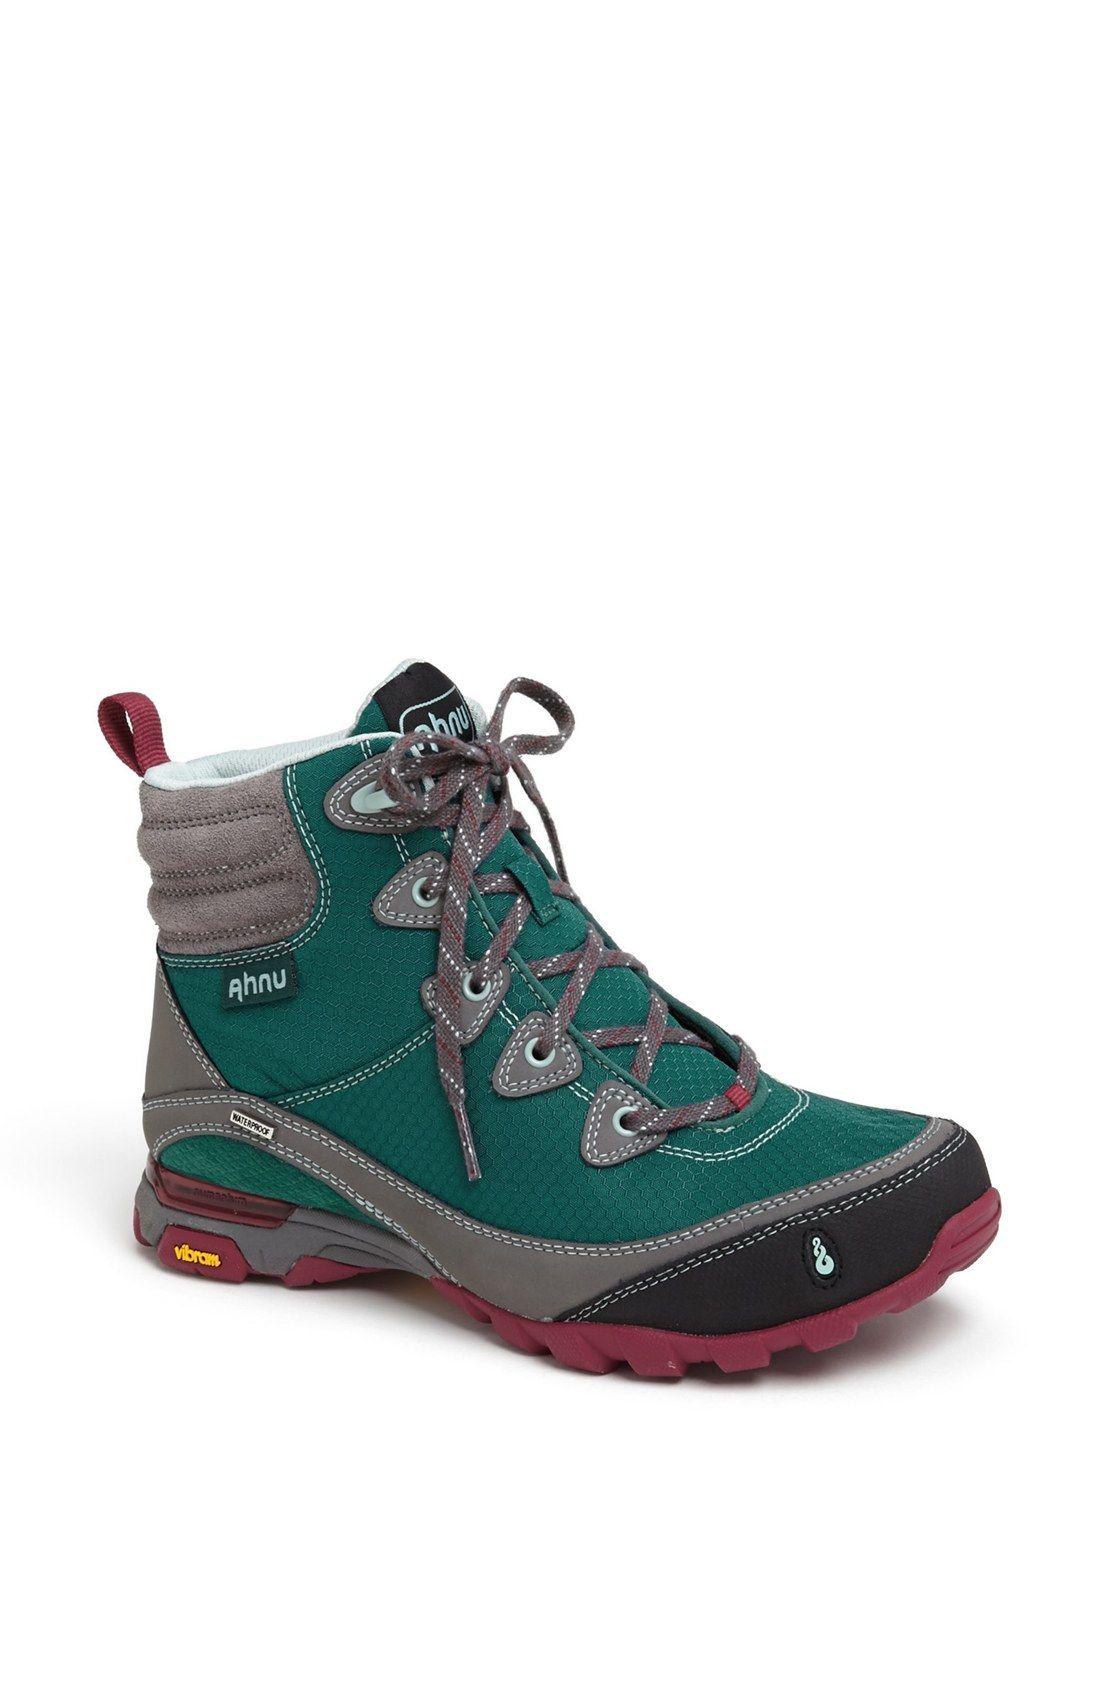 4ab04038ba4 Ahnu 'Sugarpine' Waterproof Boot | Hiking Boots in 2019 ...